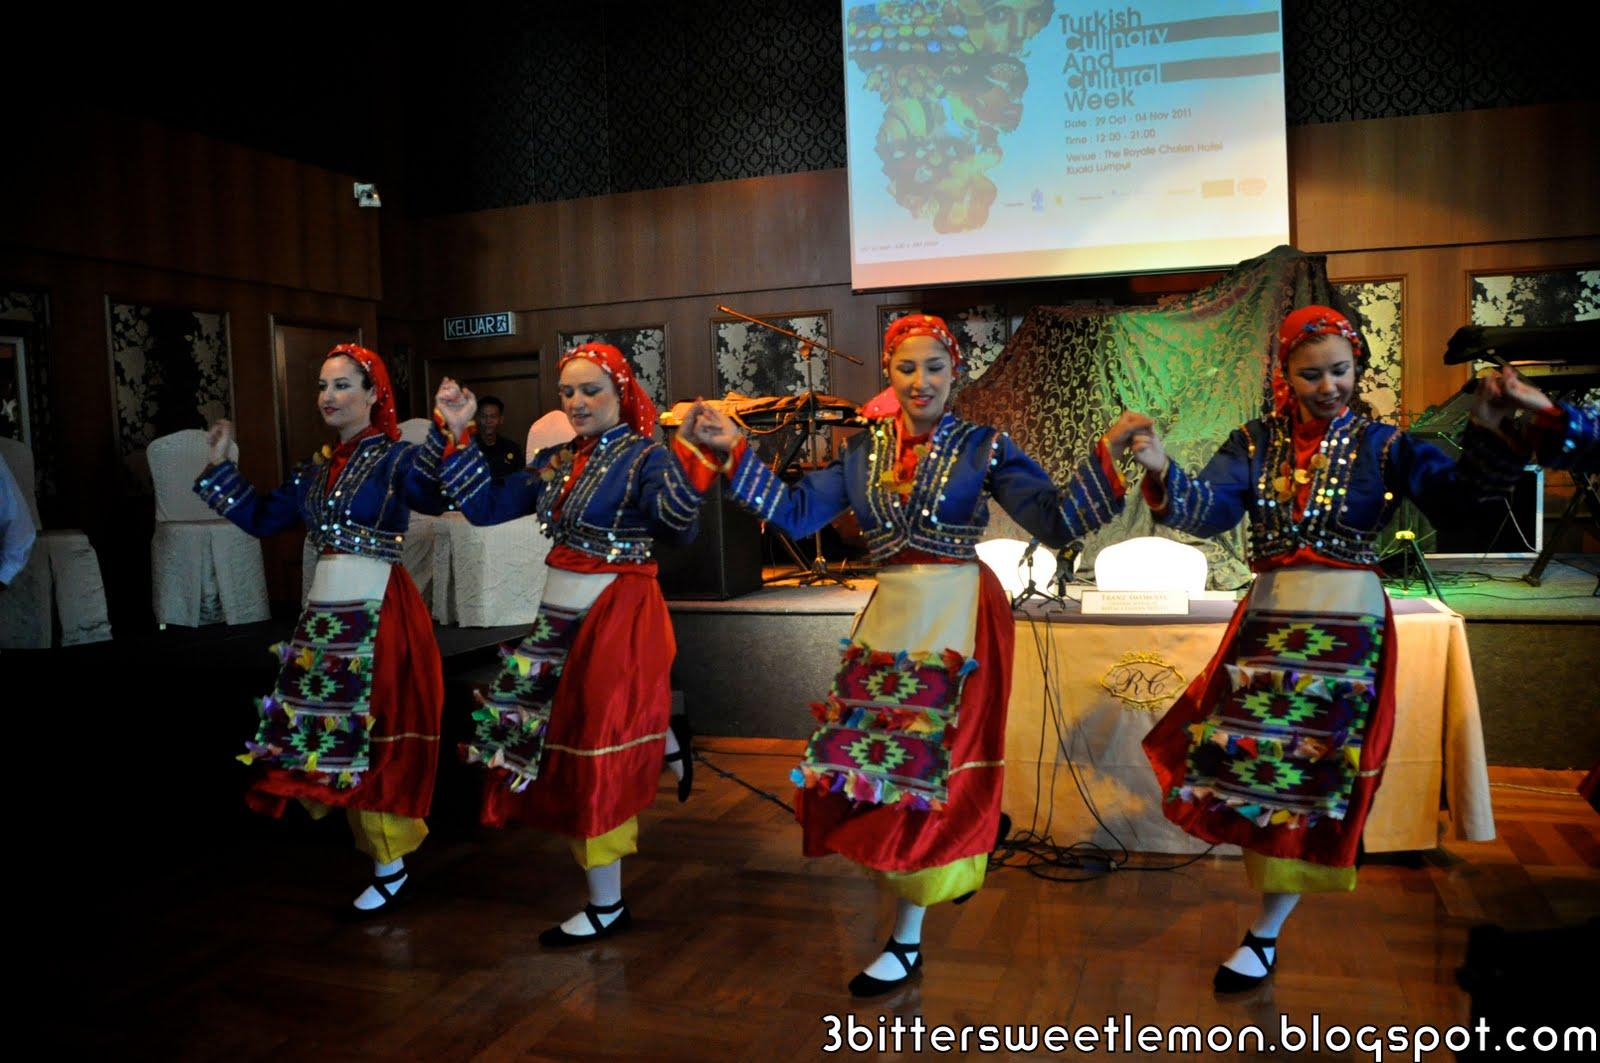 Turkish Culinary And Cultural Week 2011 Missyblurkit